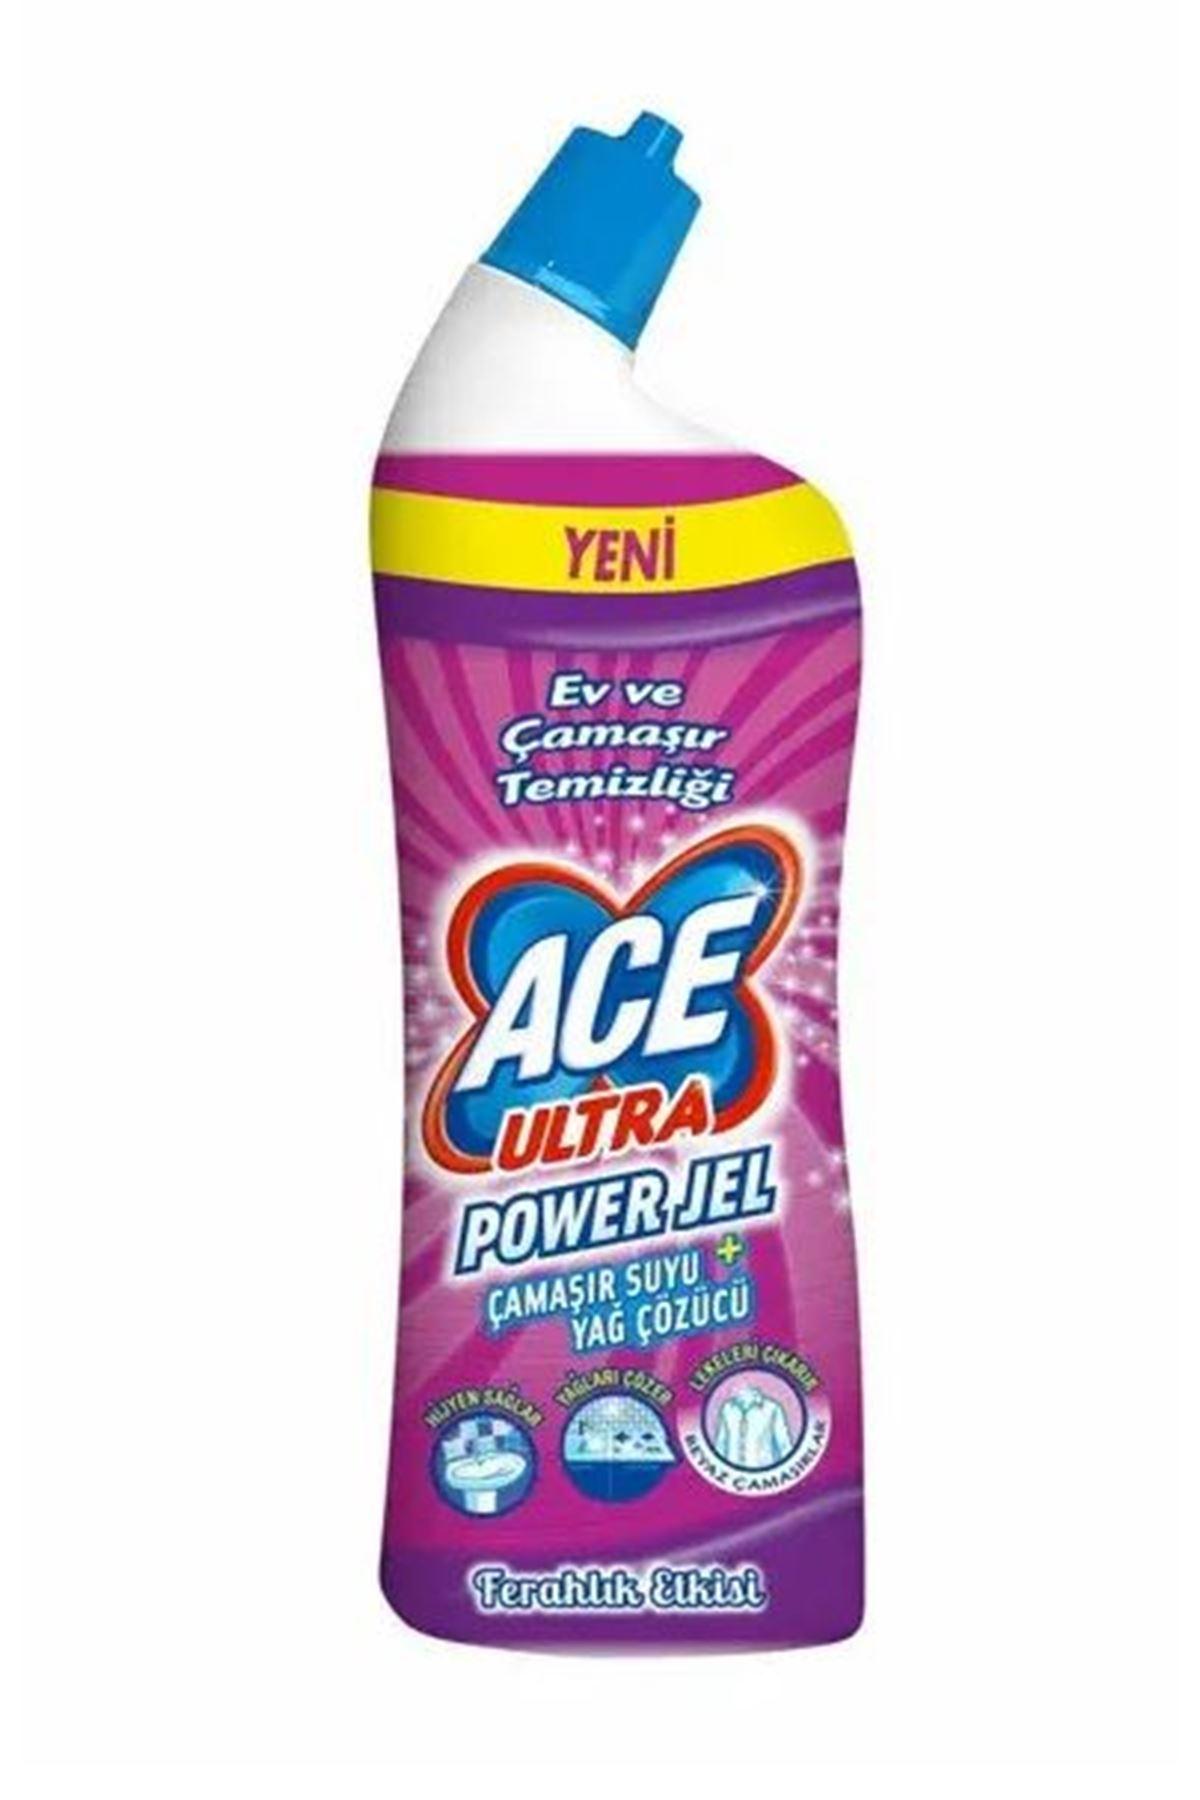 Ace Ultra Power Jel Dağ Ferahlığı Etkisi 750 ml